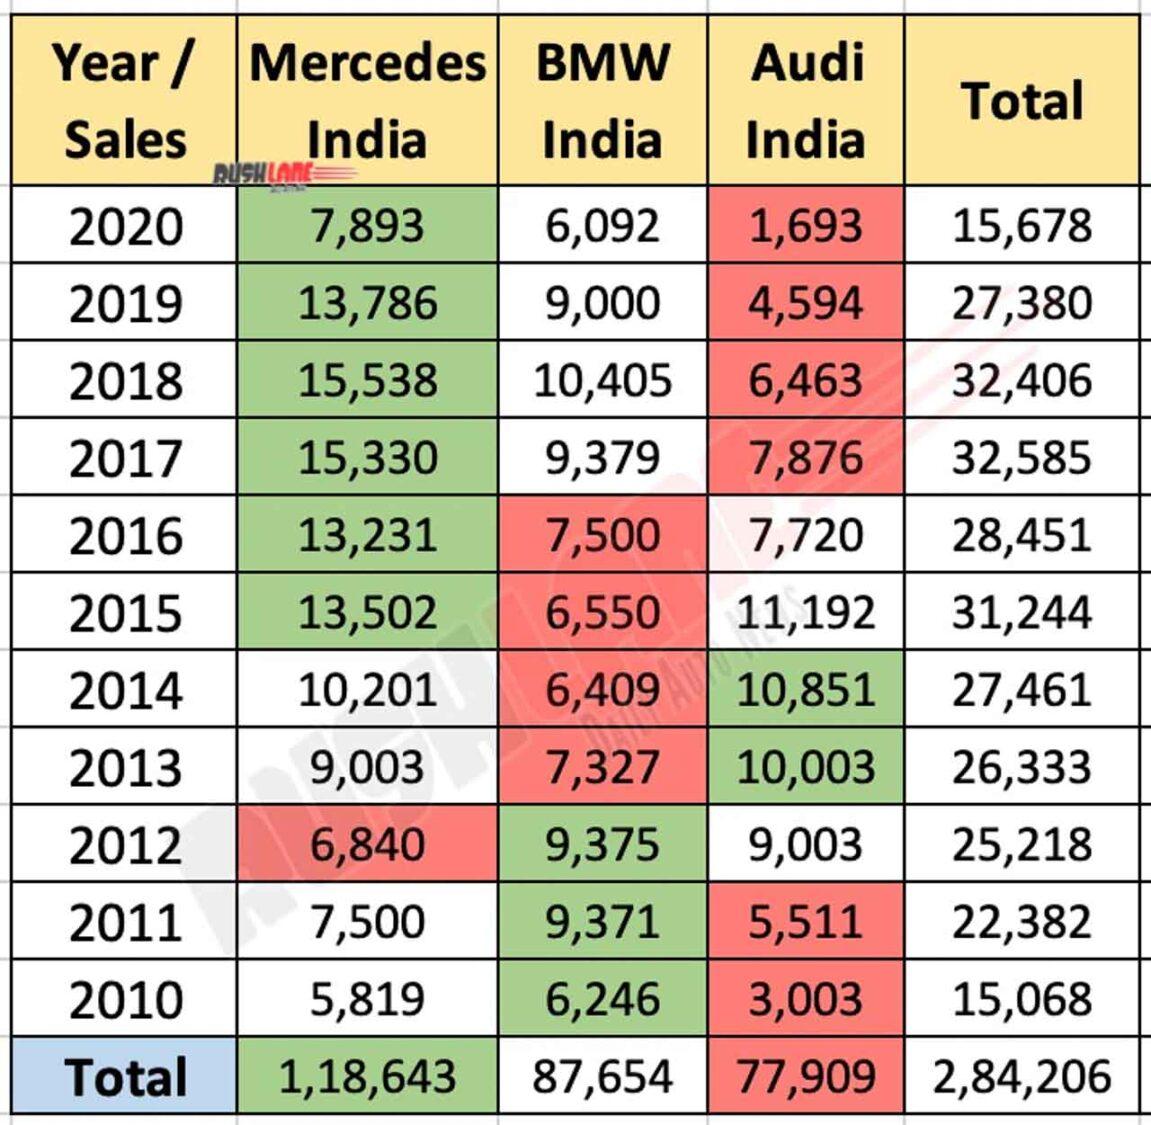 Luxury Car Sales India - CY 2020